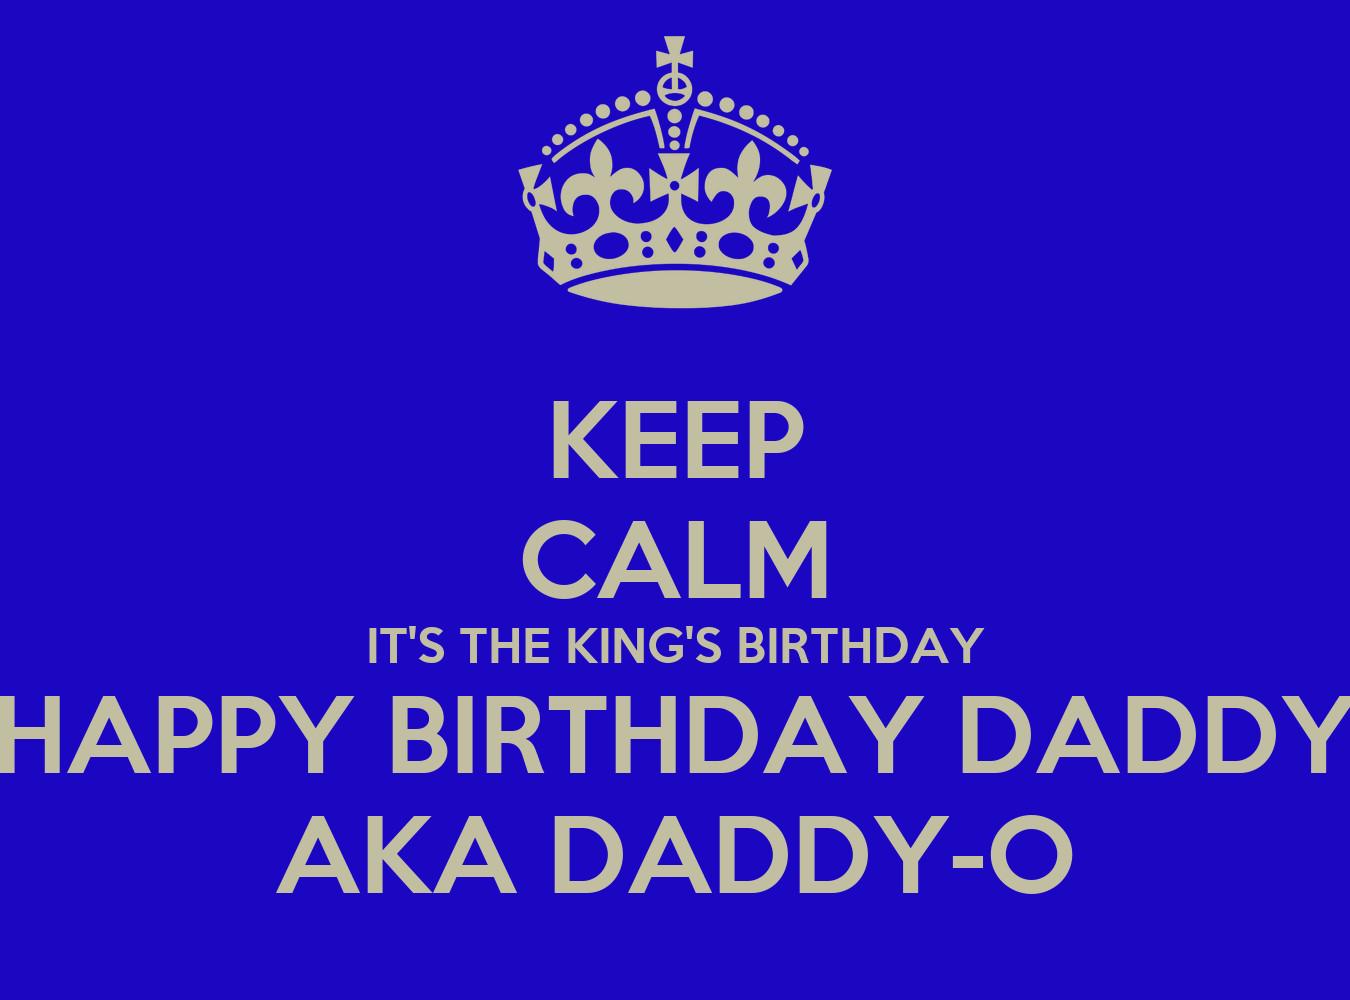 Happy Birthday Daddy Quotes  Happy Birthday Dad Quotes QuotesGram